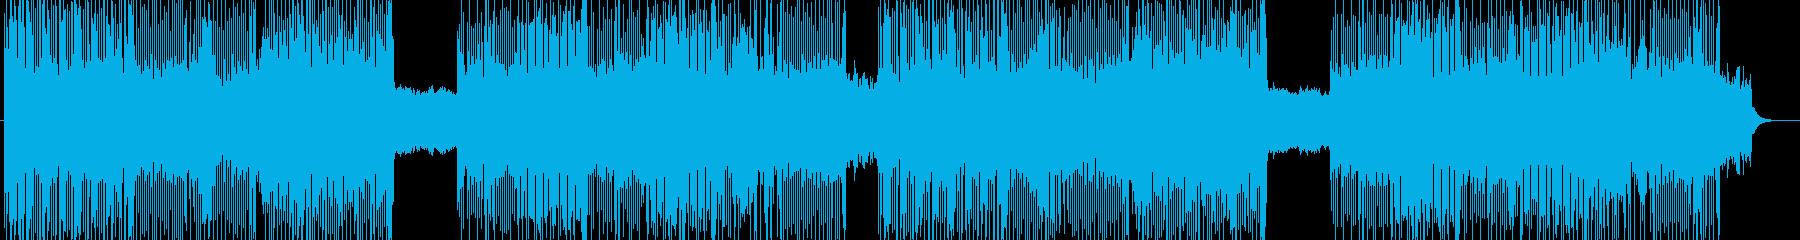 POWER ROCK、激しい 314の再生済みの波形